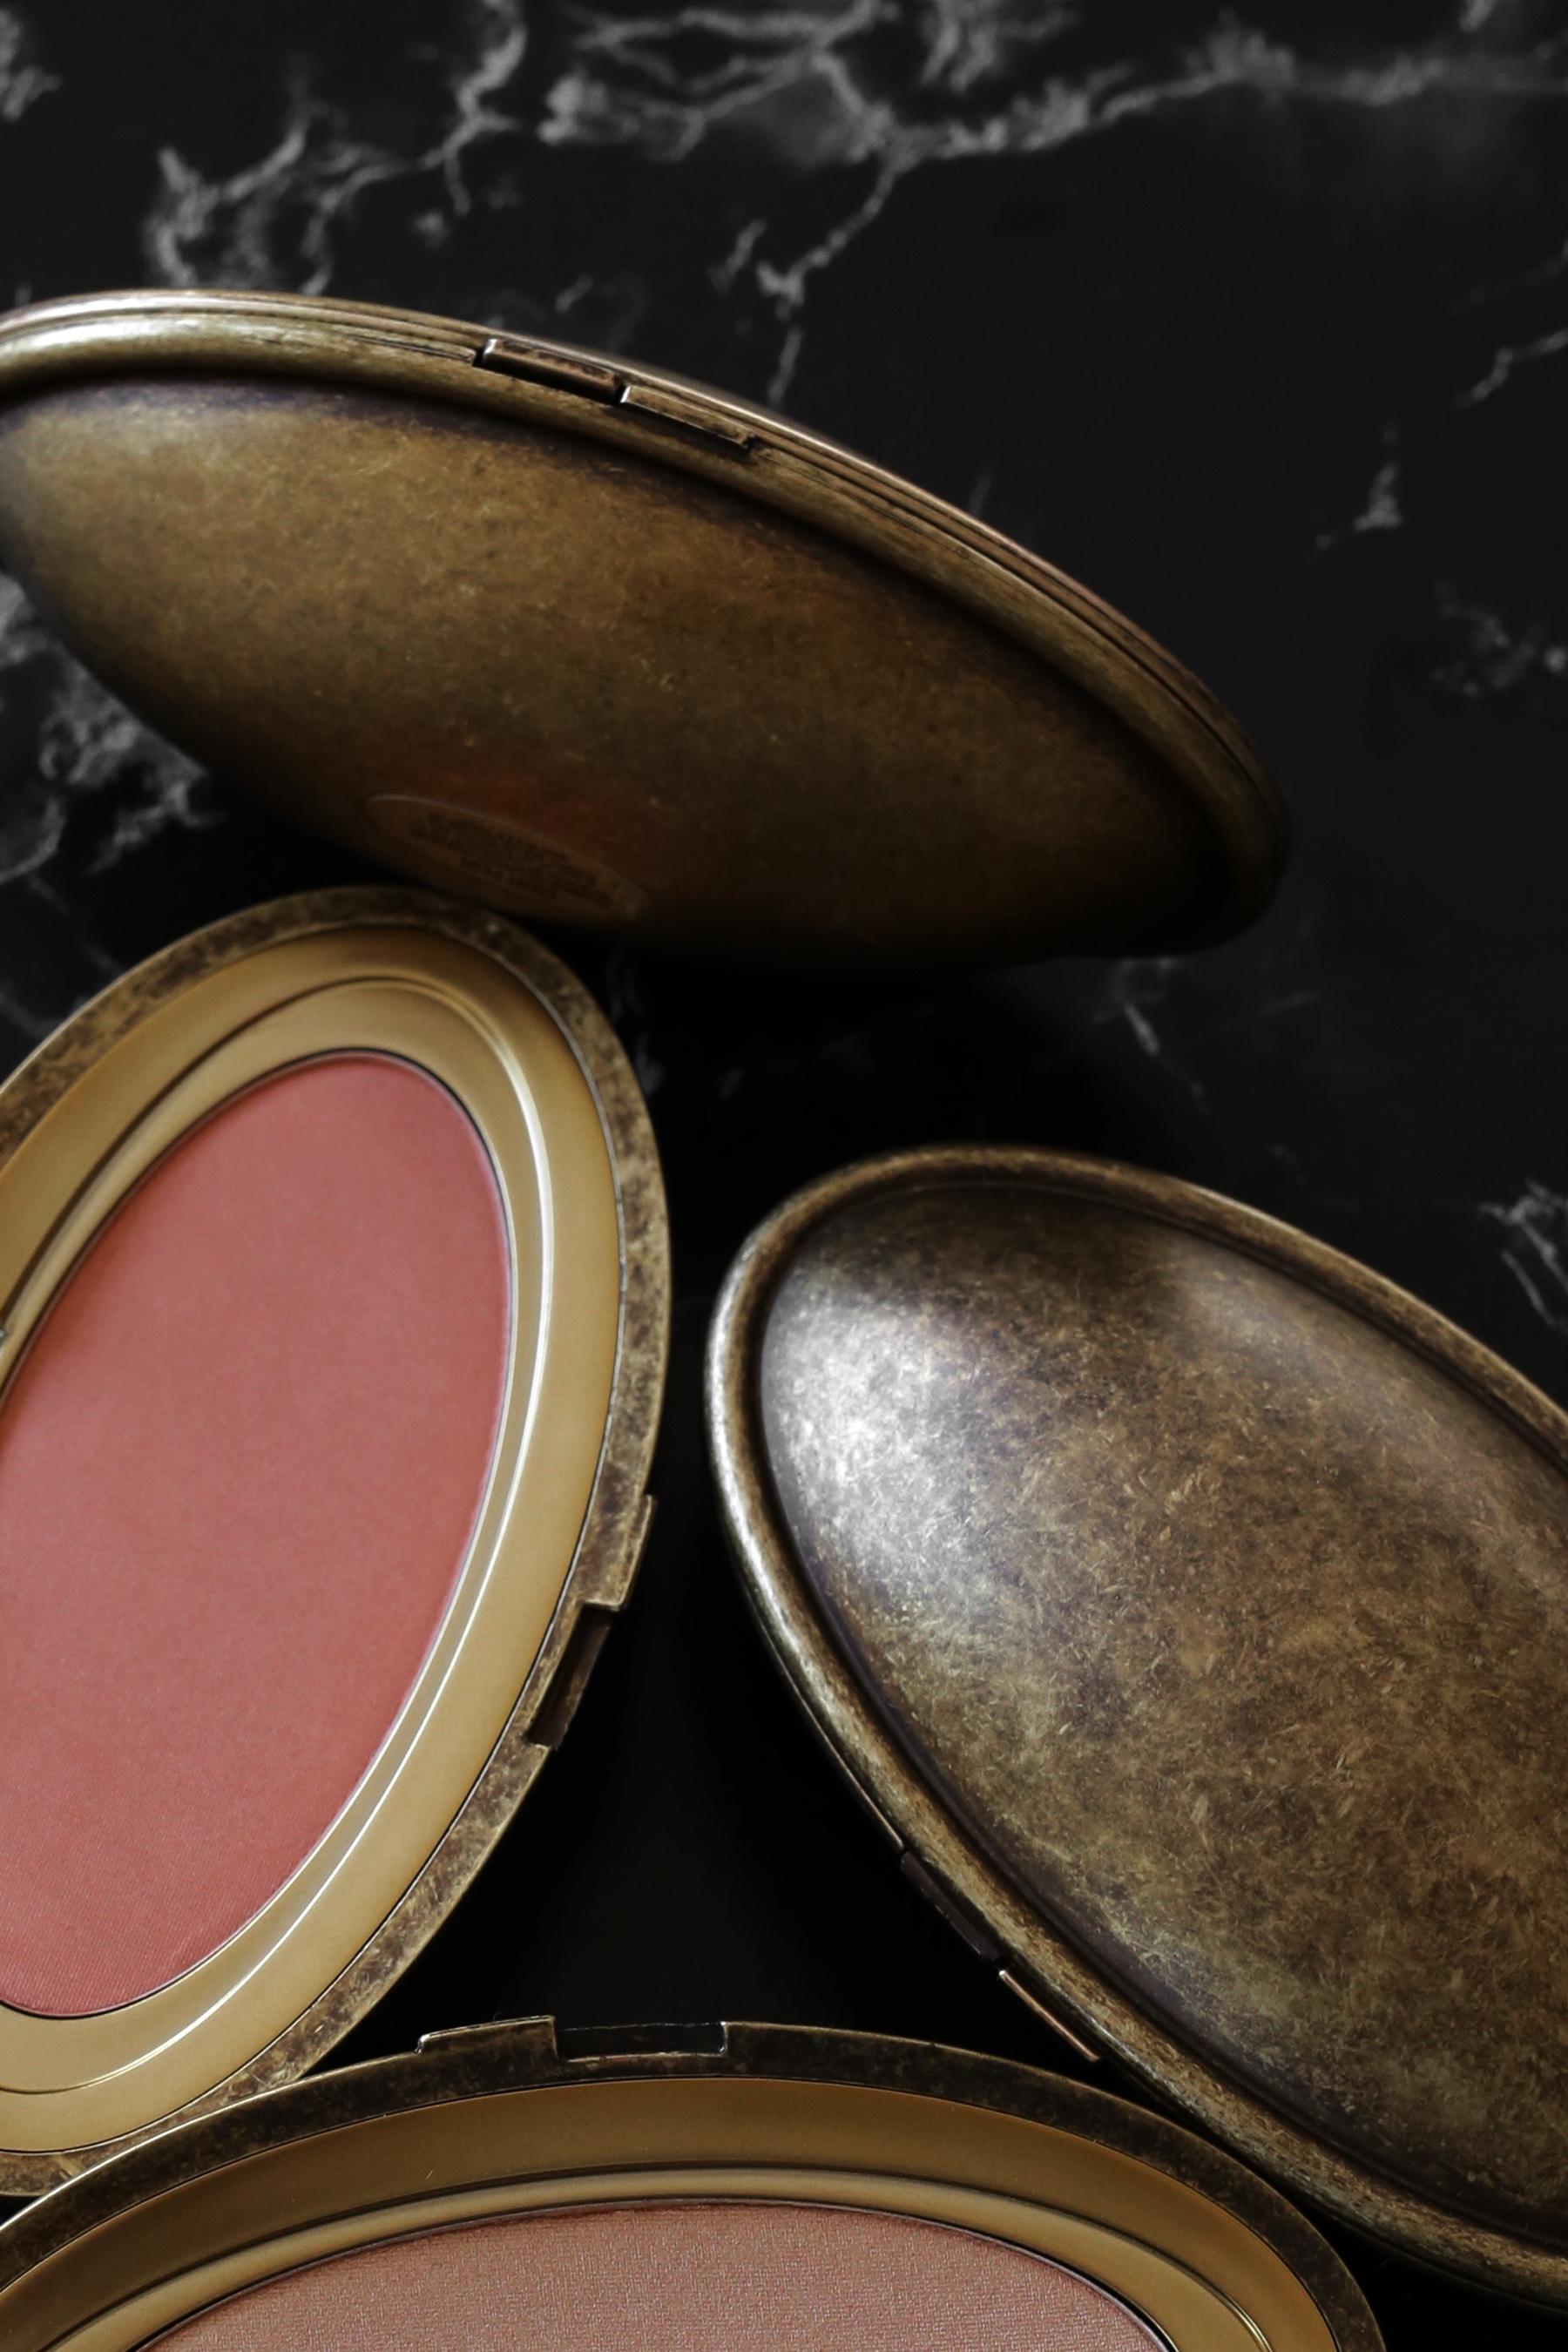 MAC x Robert Lee Morris makeup collection 2017 lipstick, blush, powder, compact, brush, beauty_5492.jpg